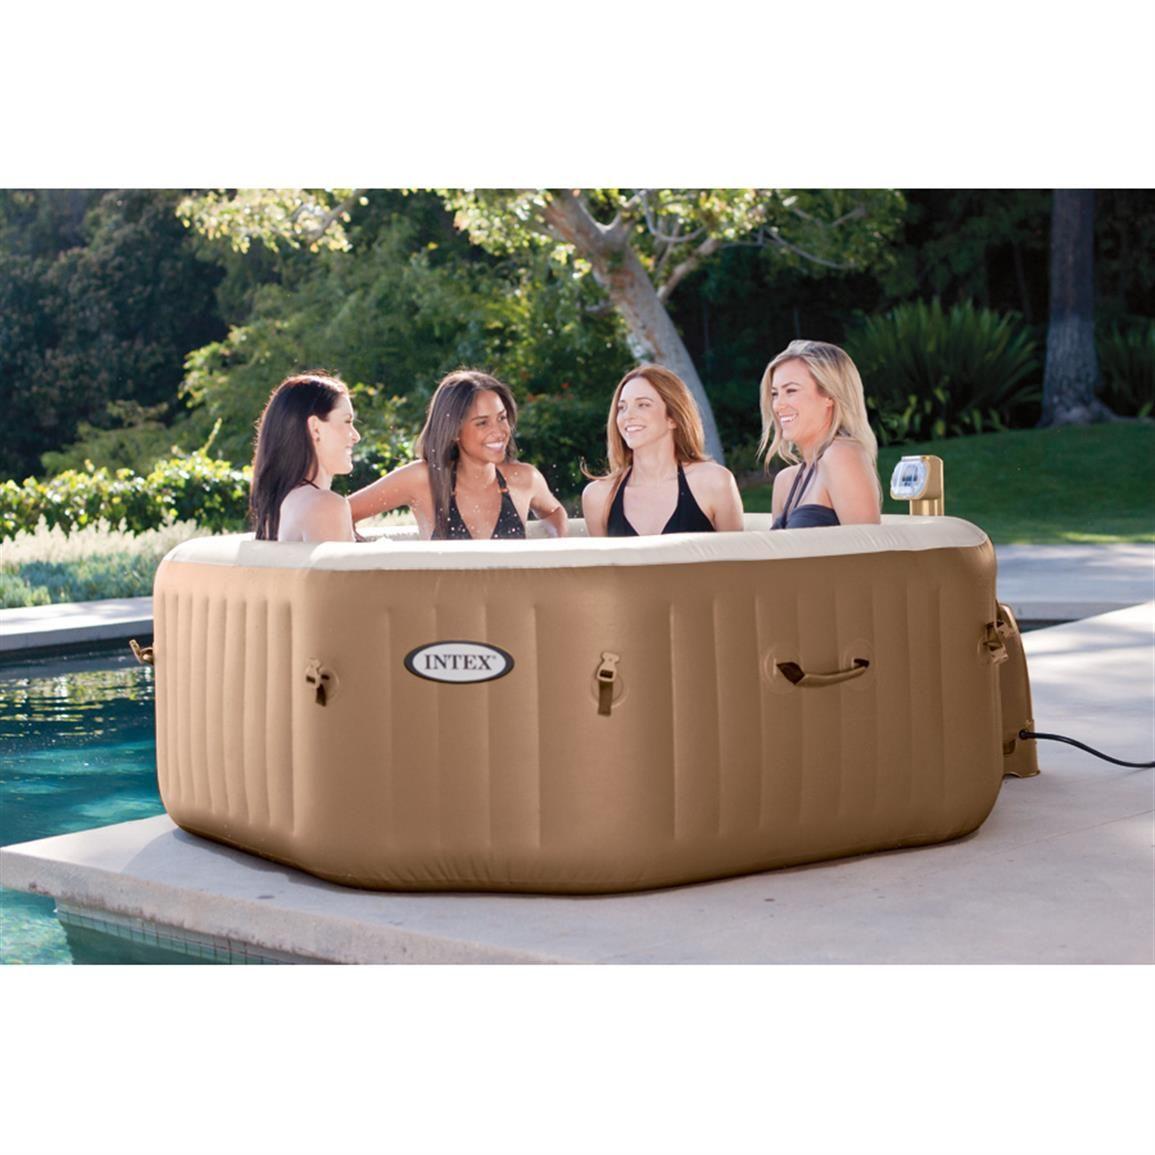 Intex PureSpa Bubble Therapy 4-person Portable Hot Tub | Hot tub ...